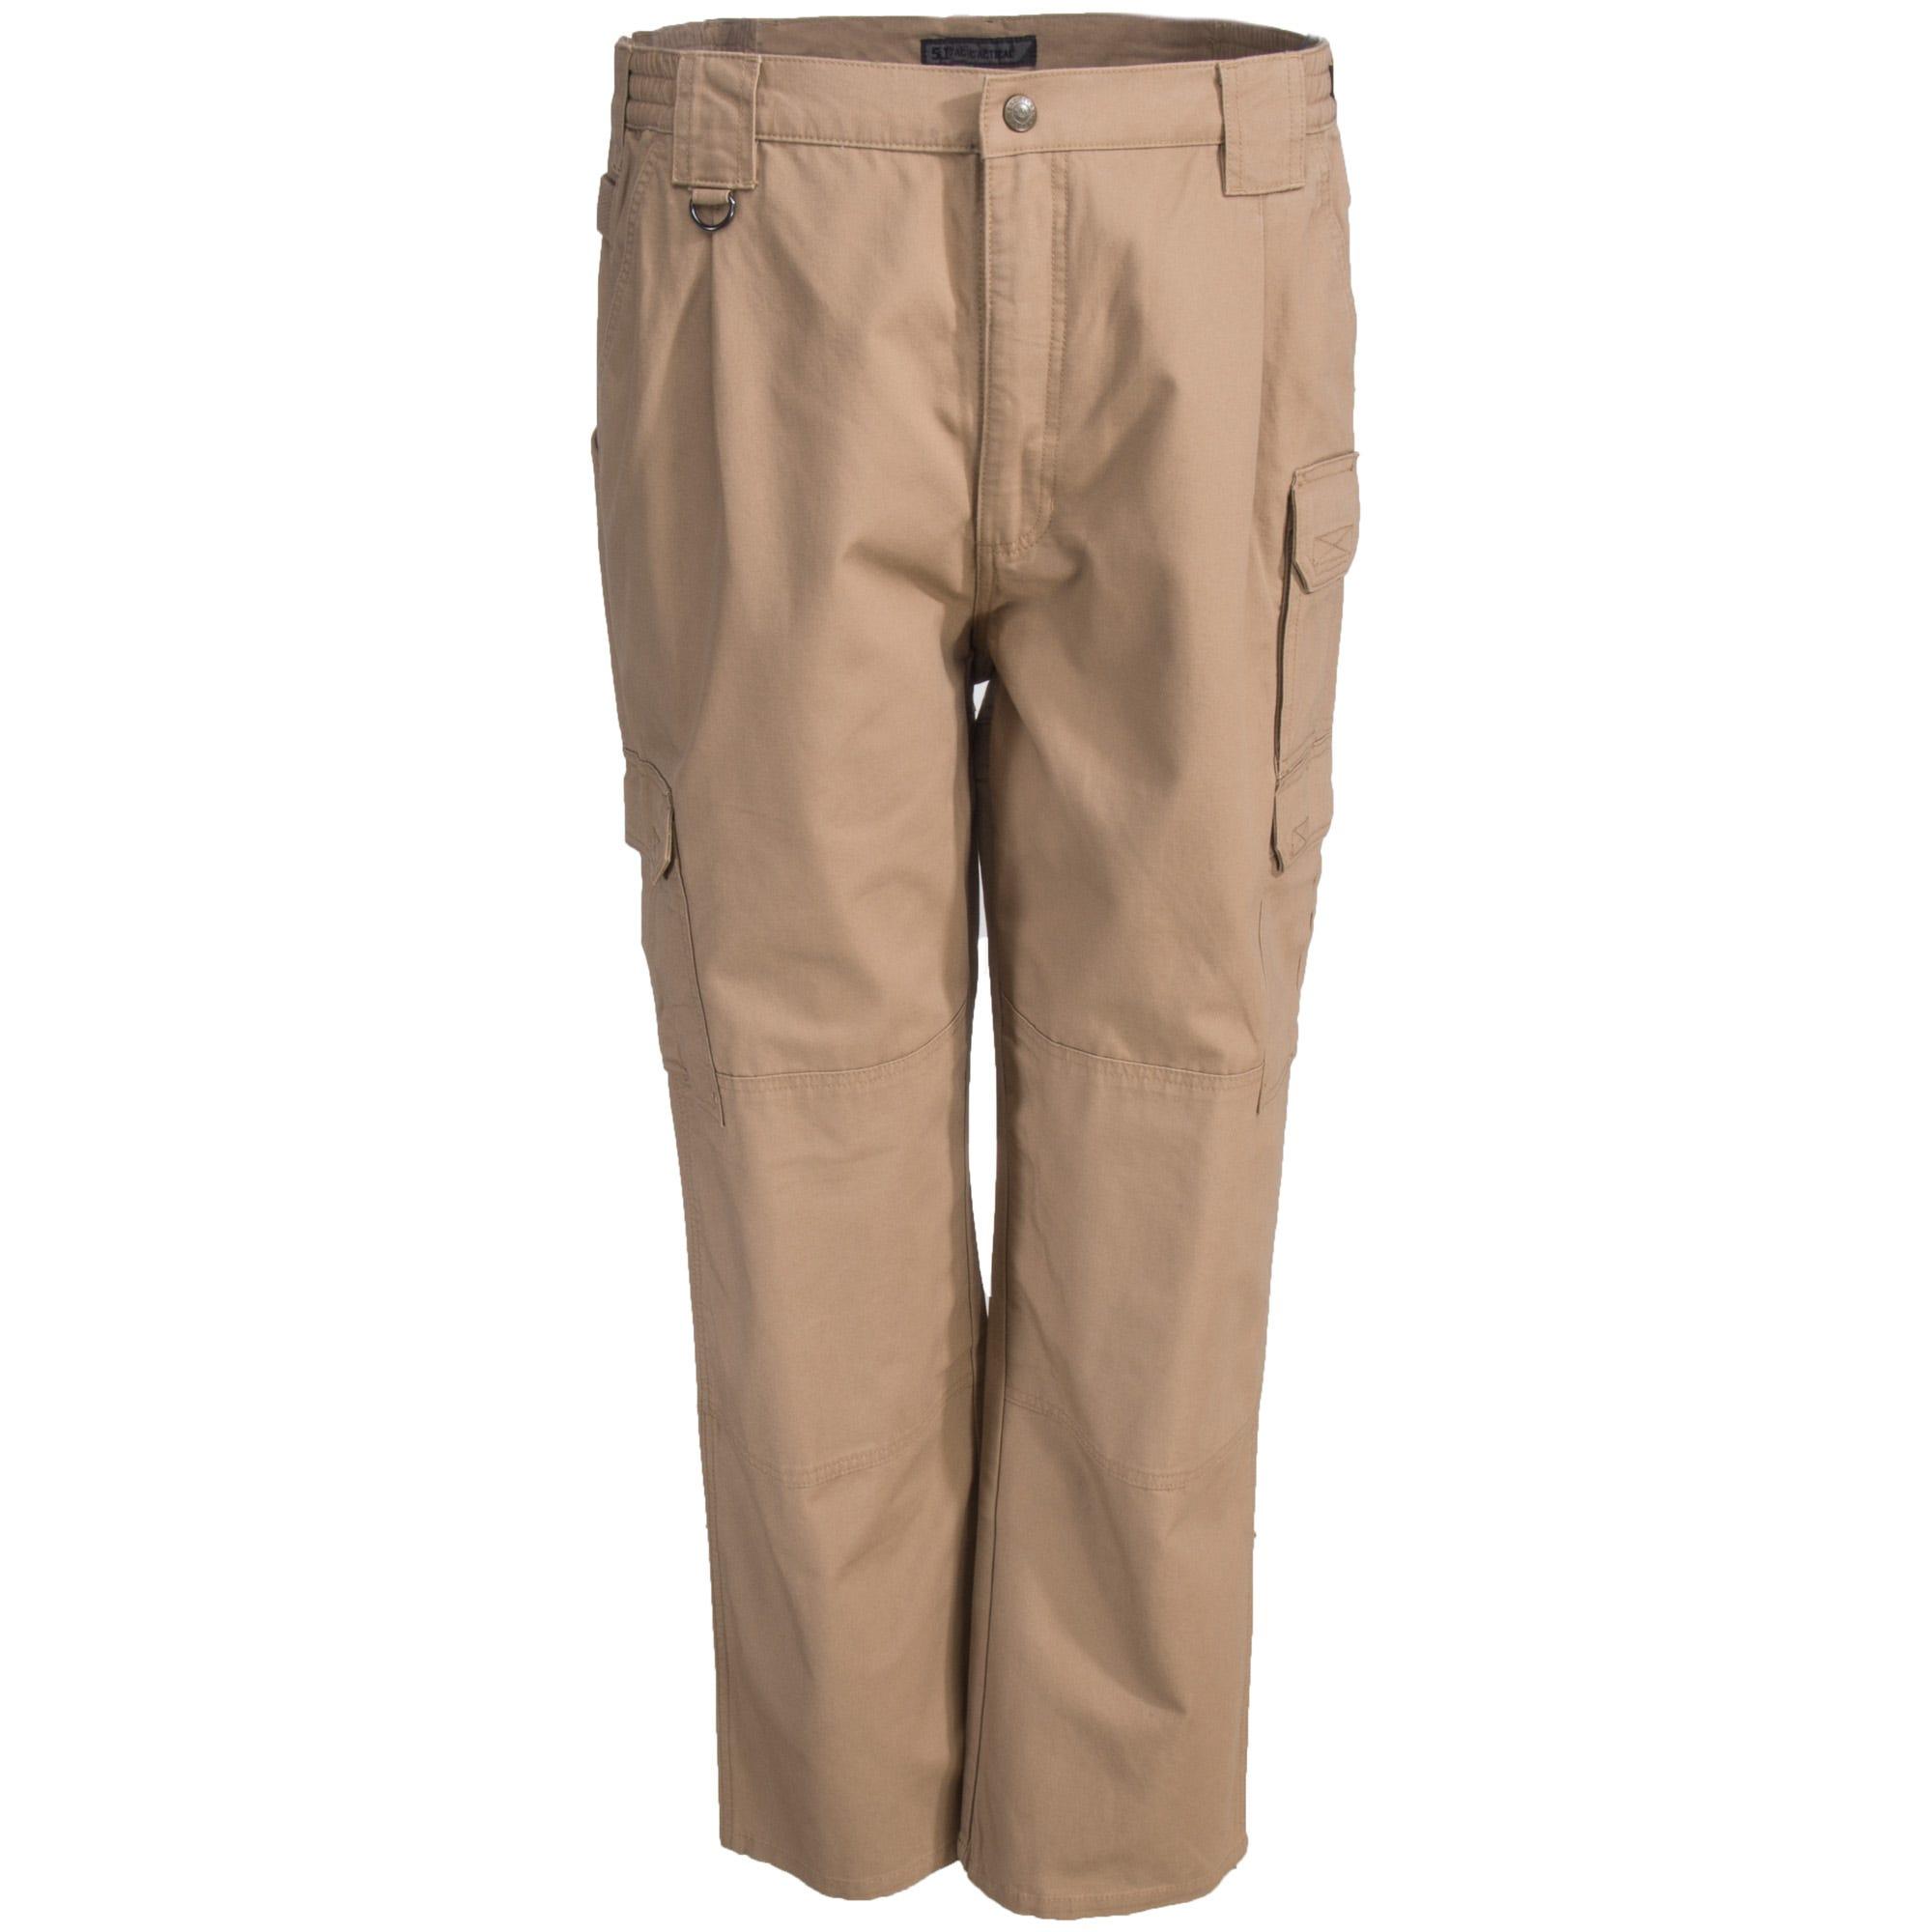 5c983af8a7 5.11 Tactical Pants  Men s Coyote 74251 120 Cotton Canvas Tactical ...